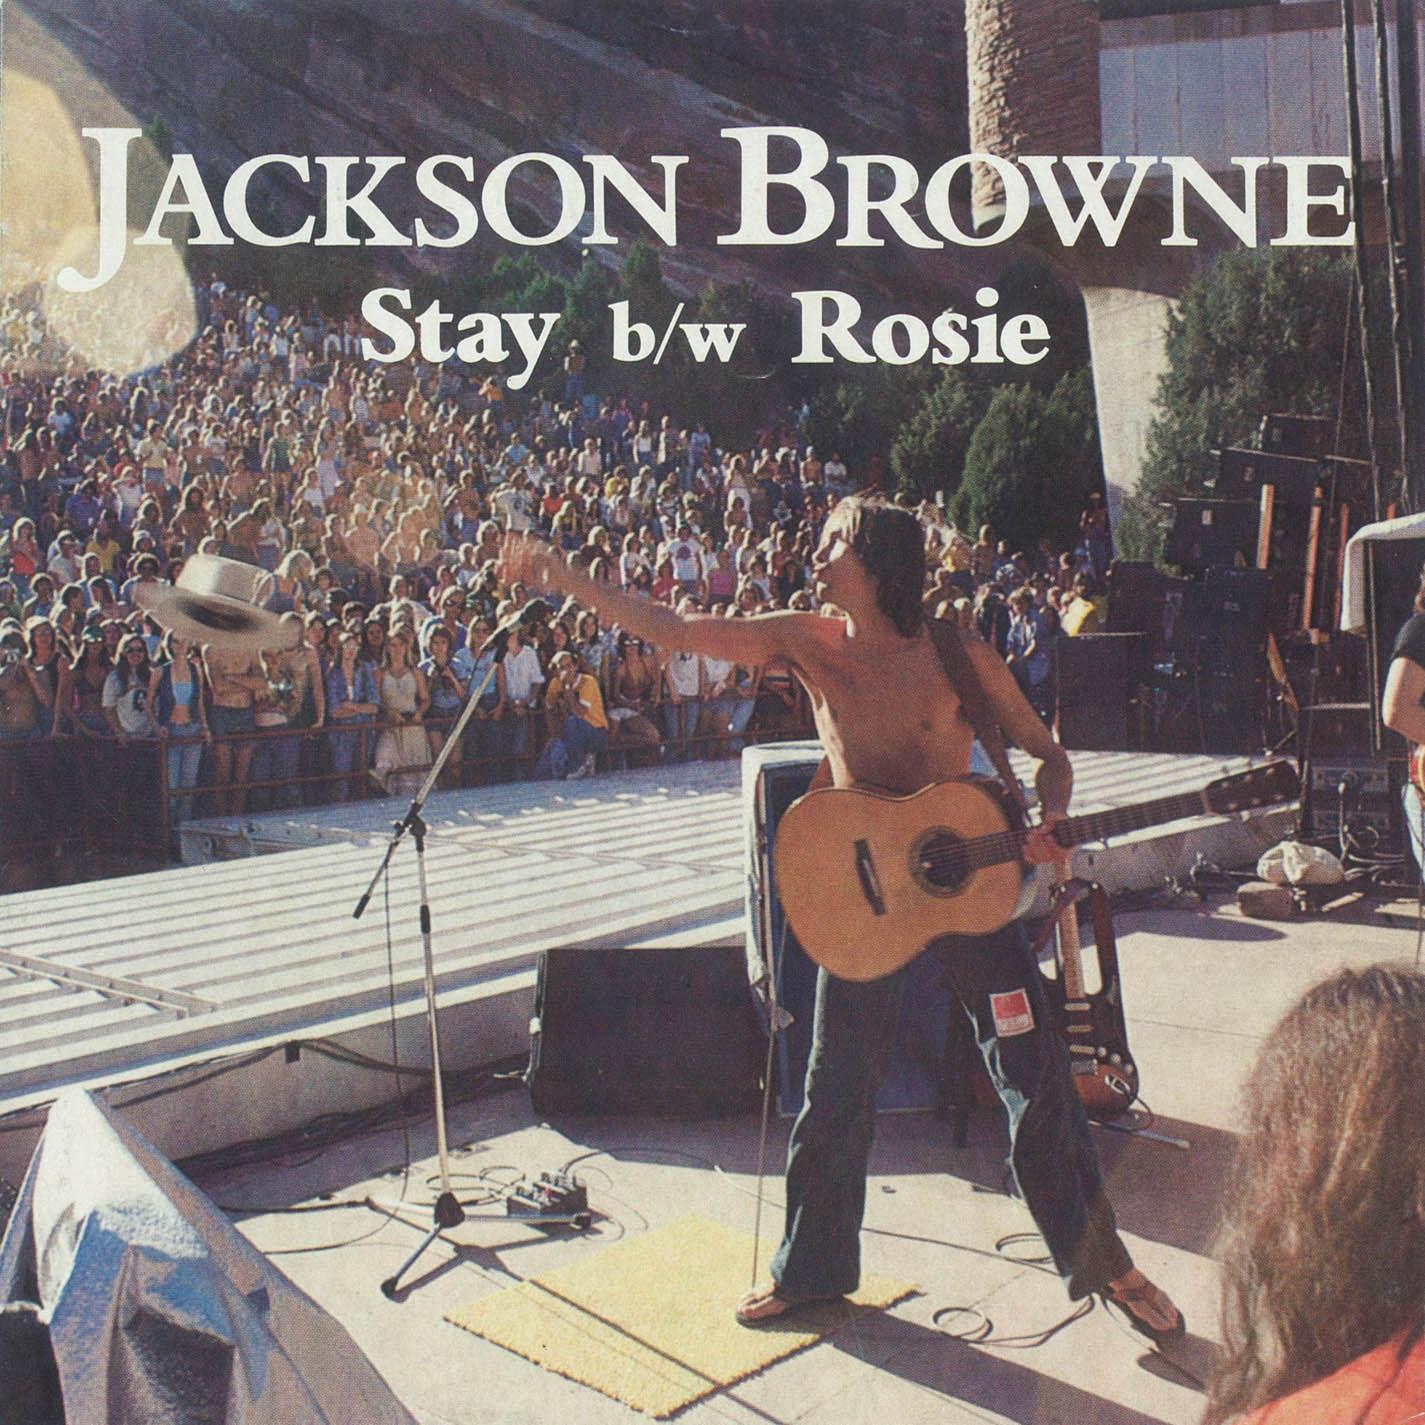 Jackson Browne - Stay | iHeartRadio